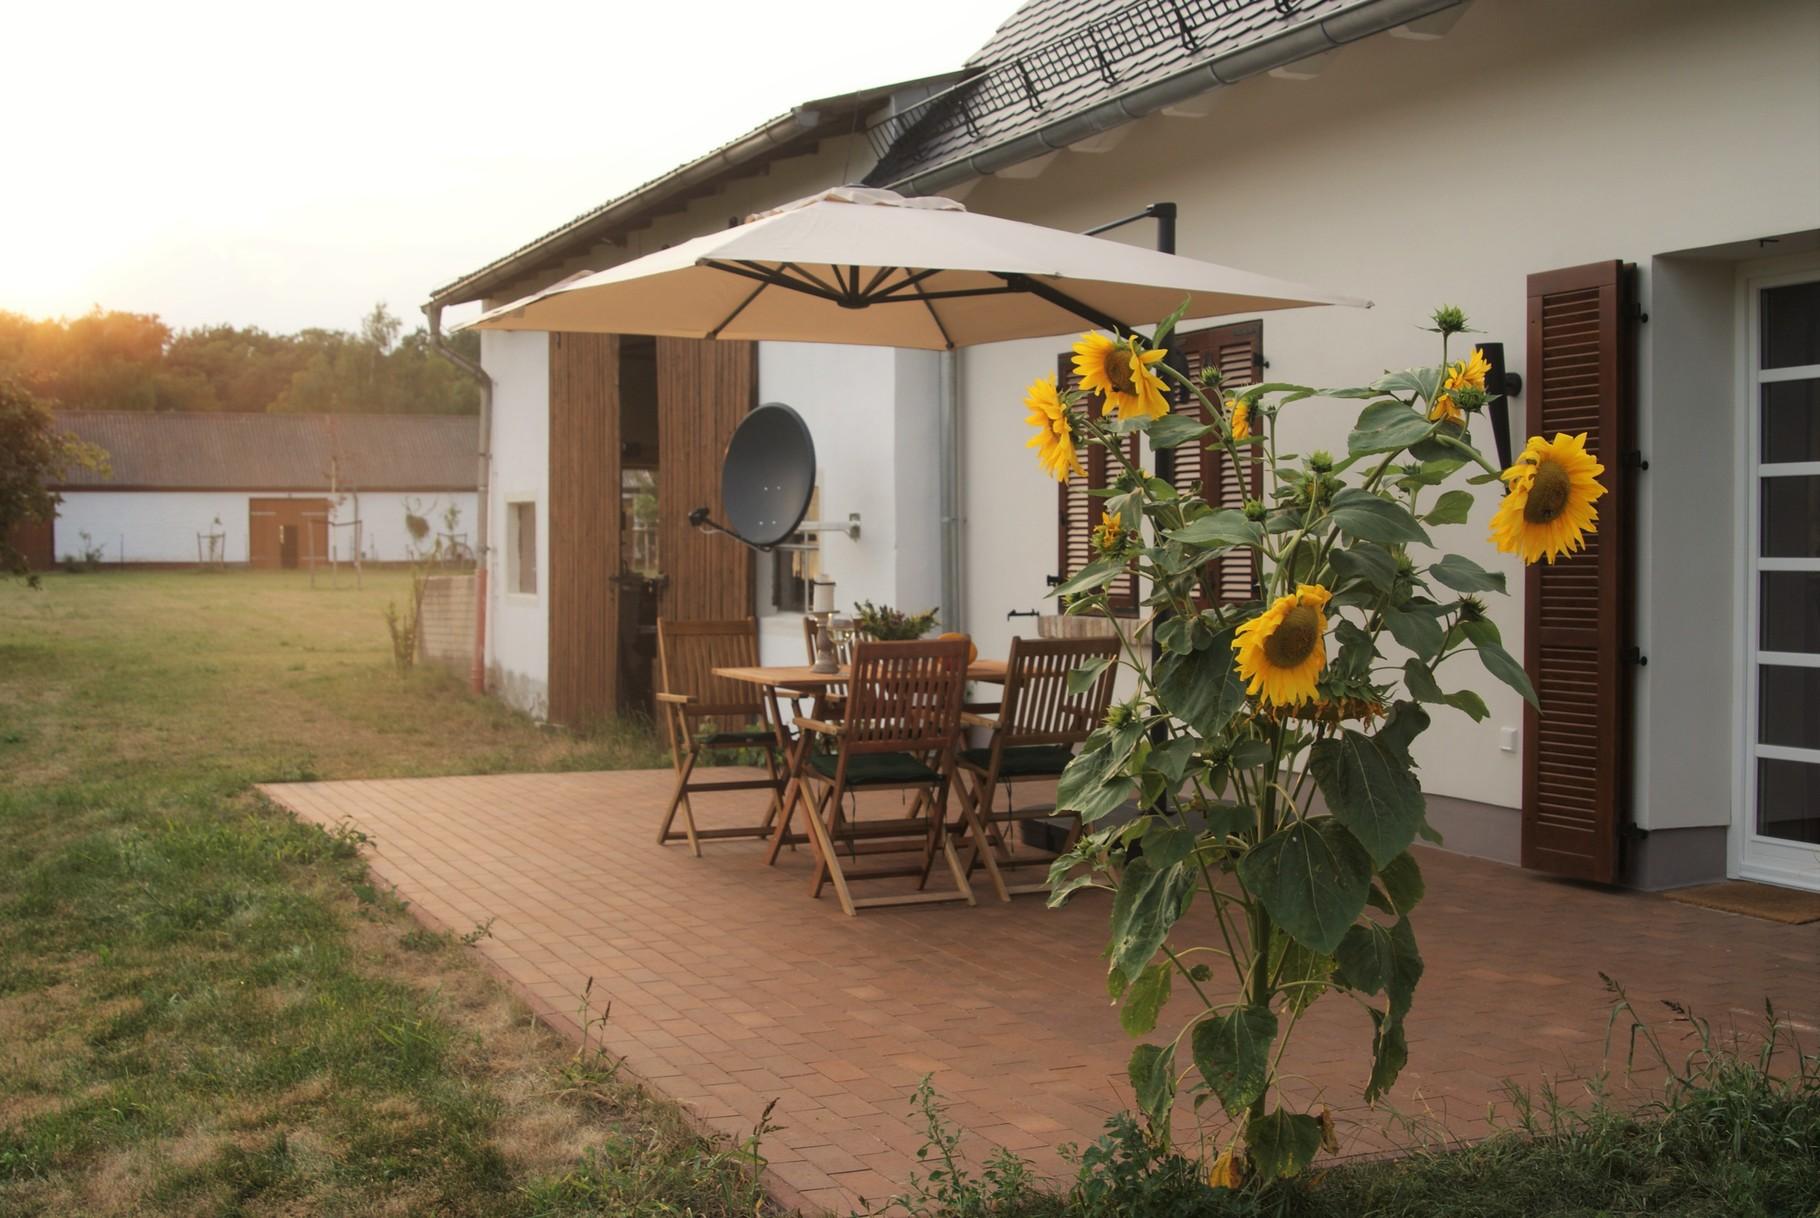 AUGUST private Terrasse mit Blick ins grüne Idyll